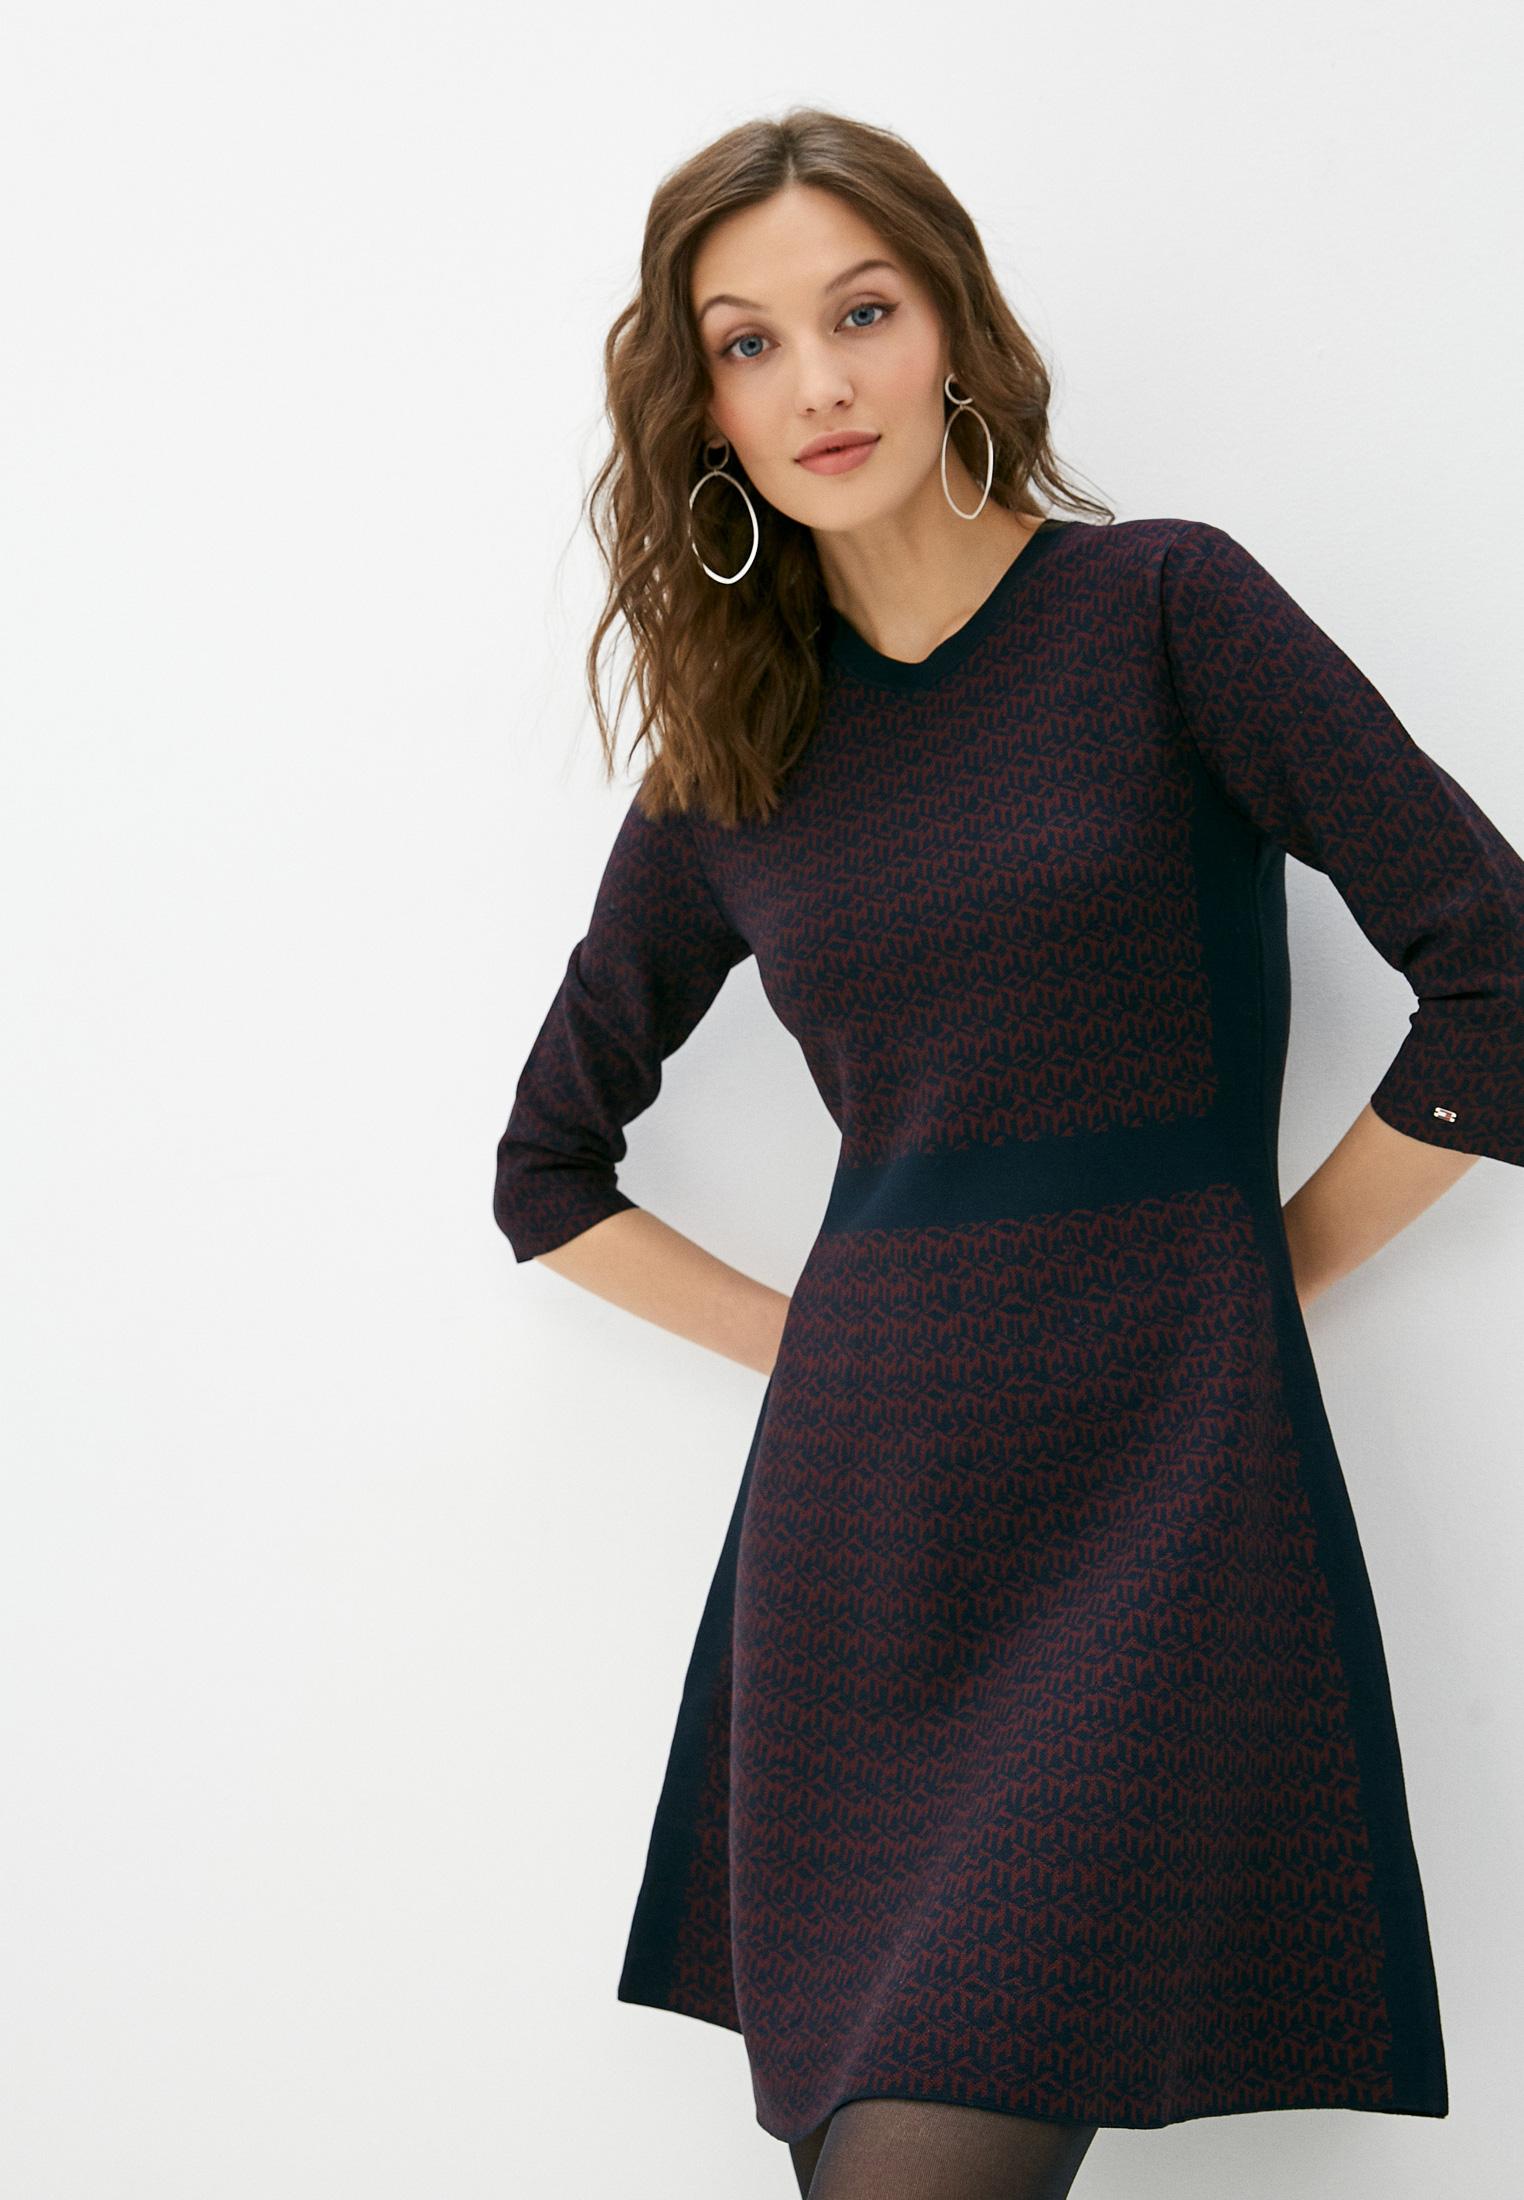 Вязаное платье Tommy Hilfiger (Томми Хилфигер) Платье Tommy Hilfiger